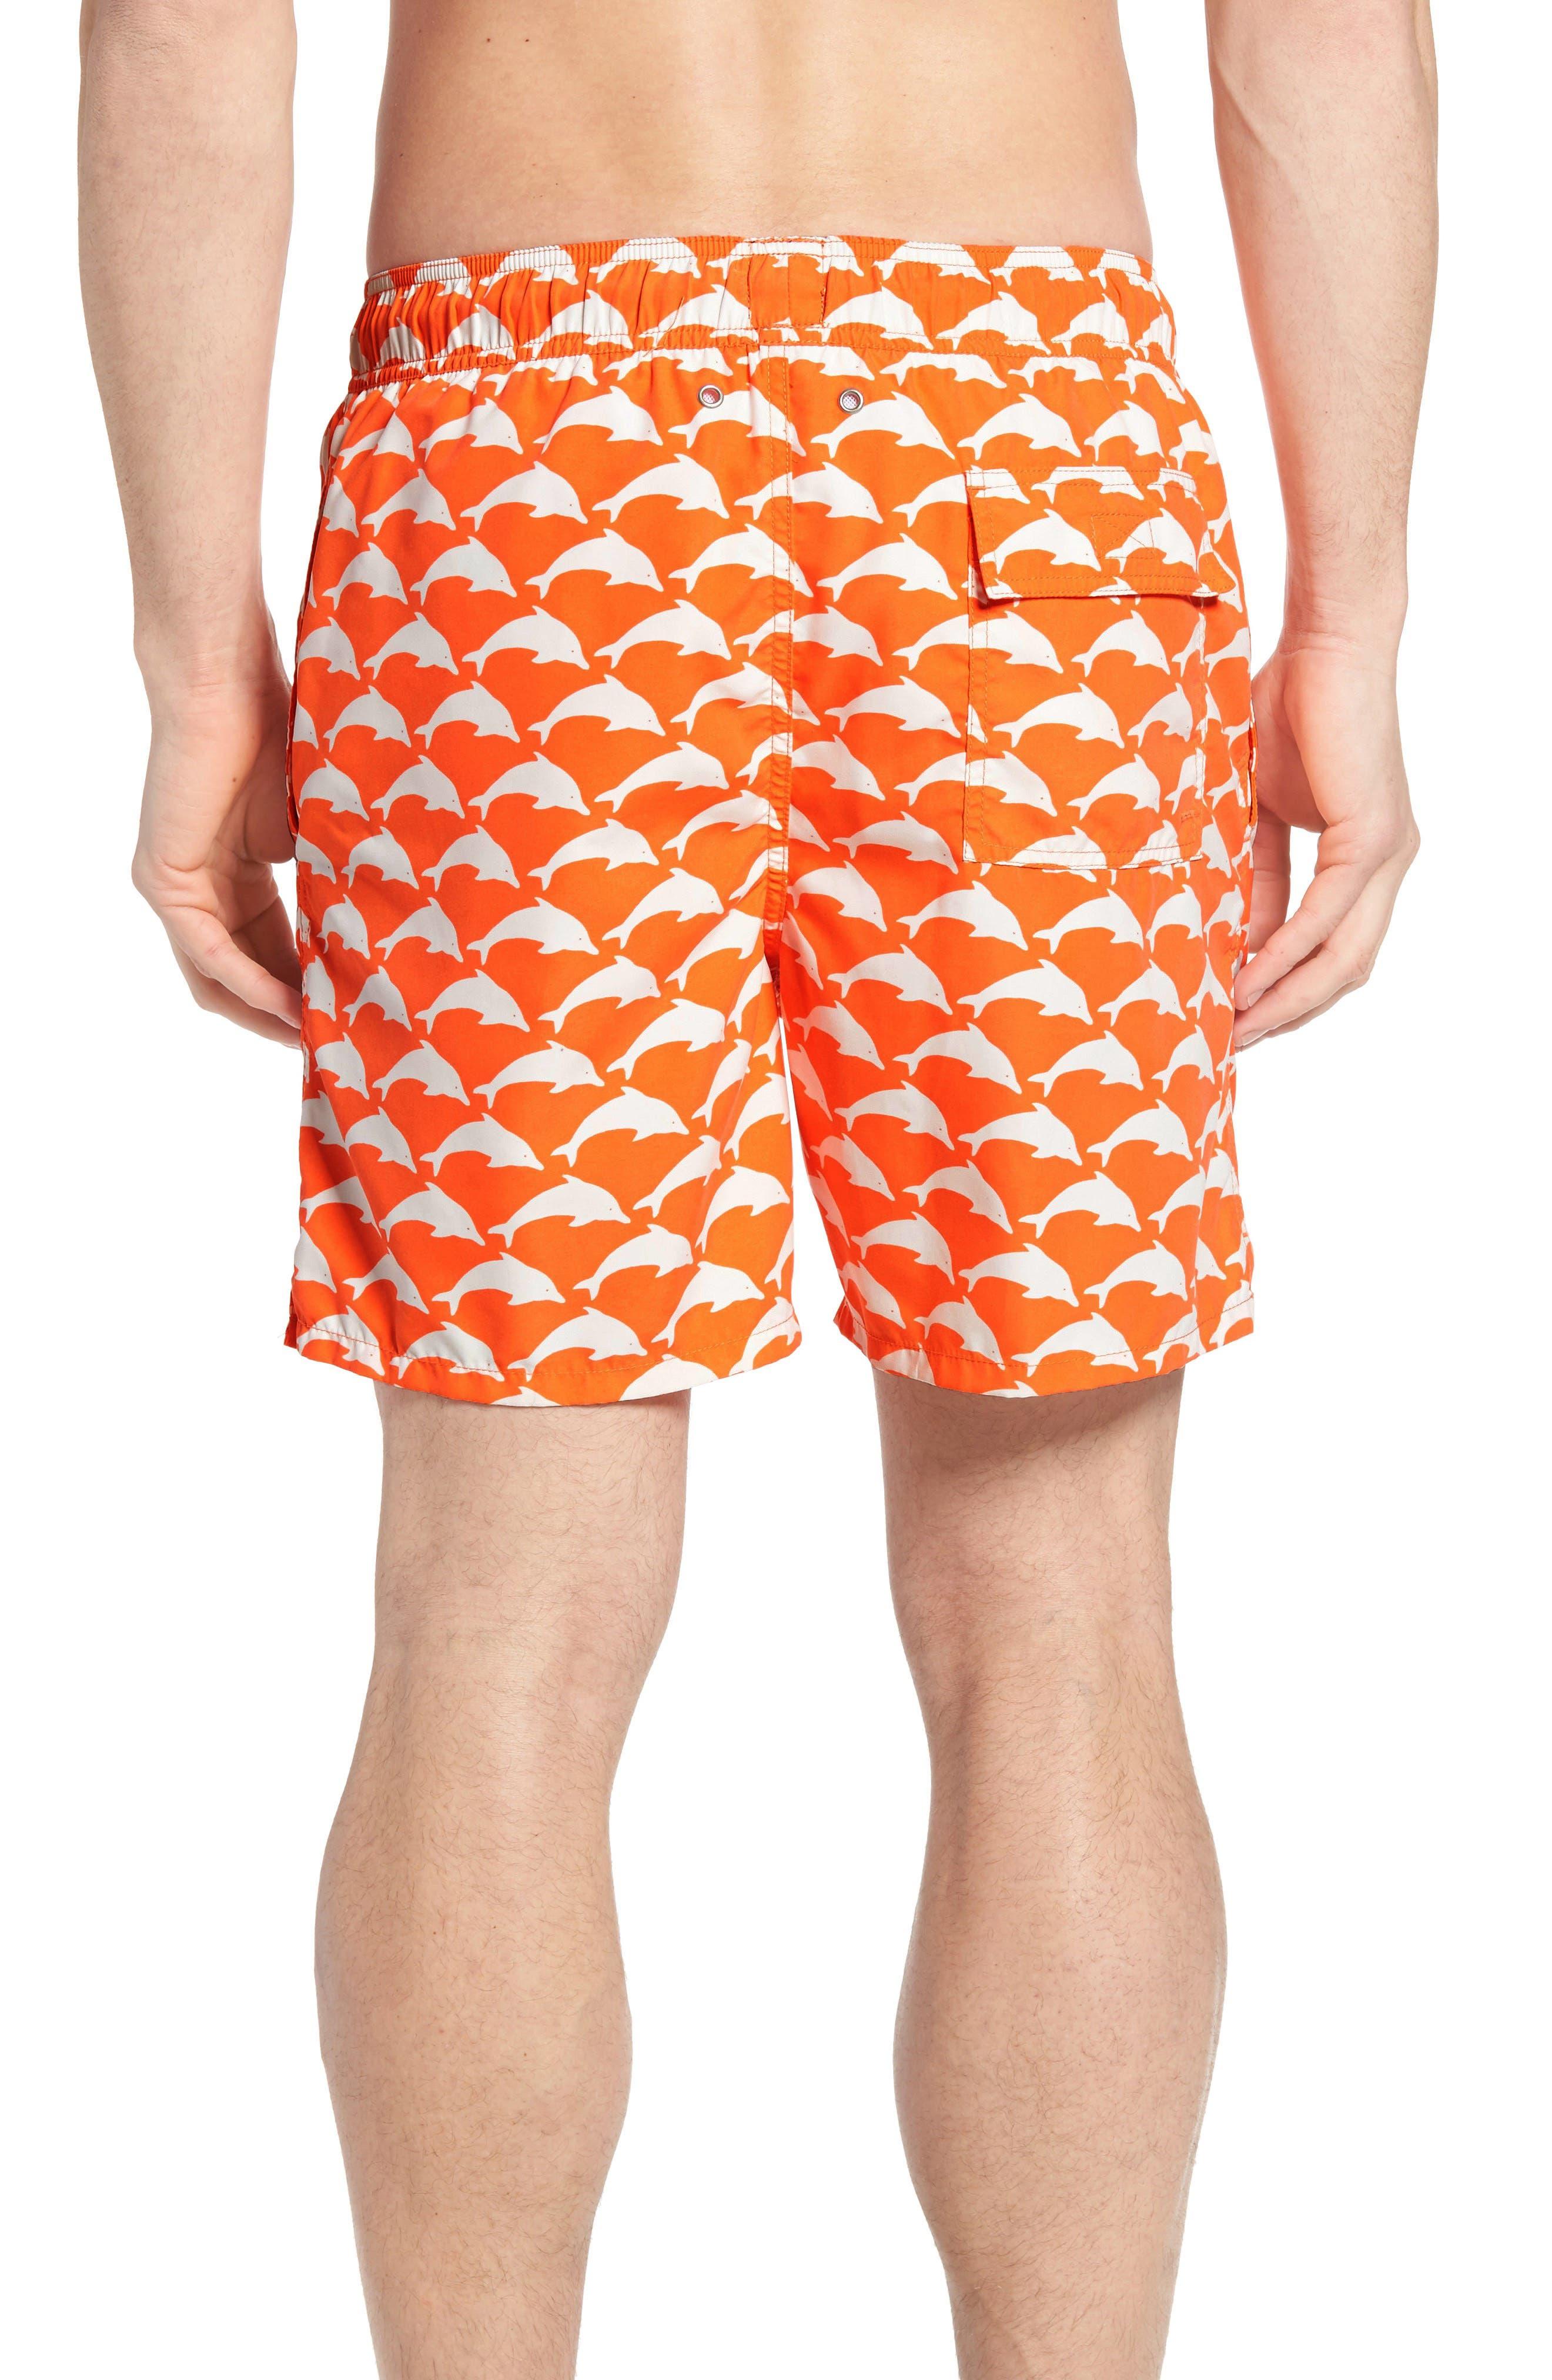 Dolphin Print Swim Trunks,                             Alternate thumbnail 2, color,                             Orange White